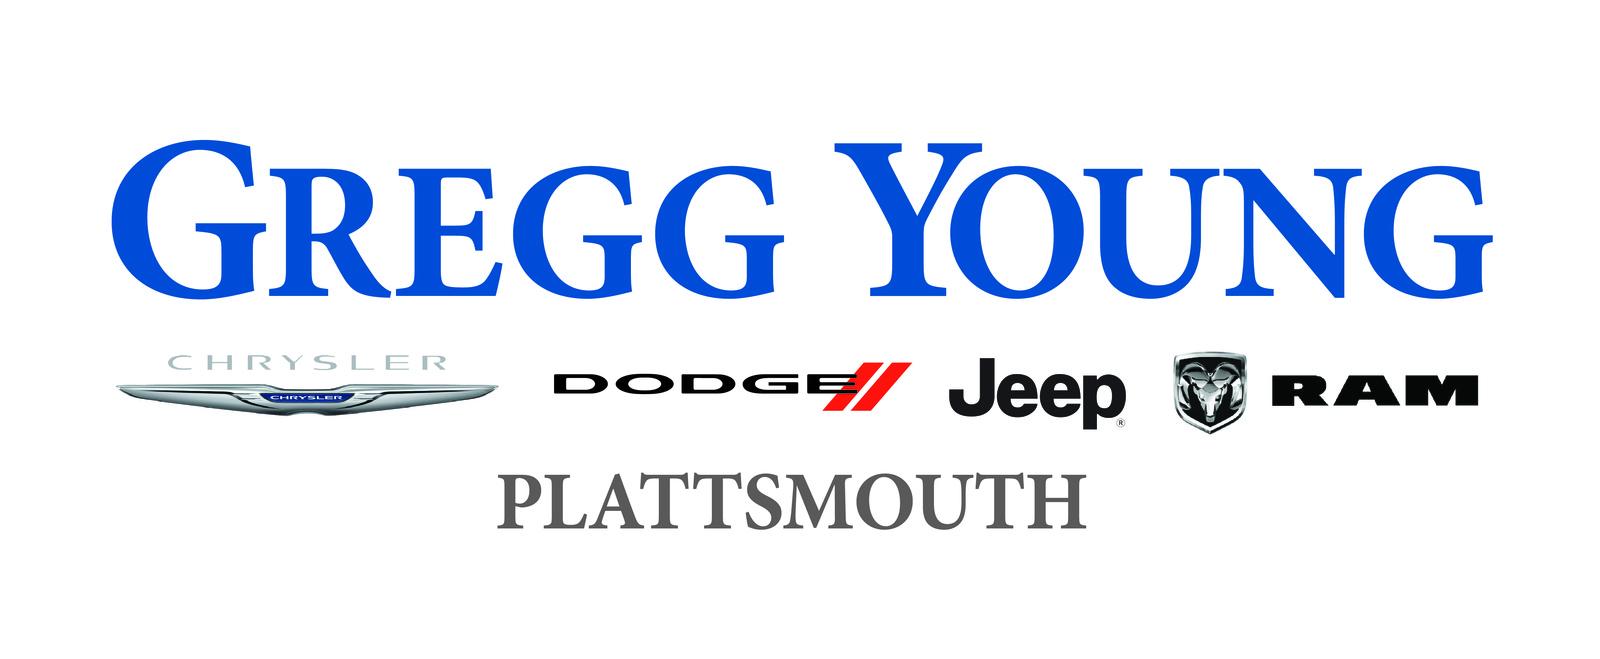 Gregg Young Chevrolet >> Gregg Young Chrysler Dodge Jeep Ram Plattsmouth Plattsmouth Ne